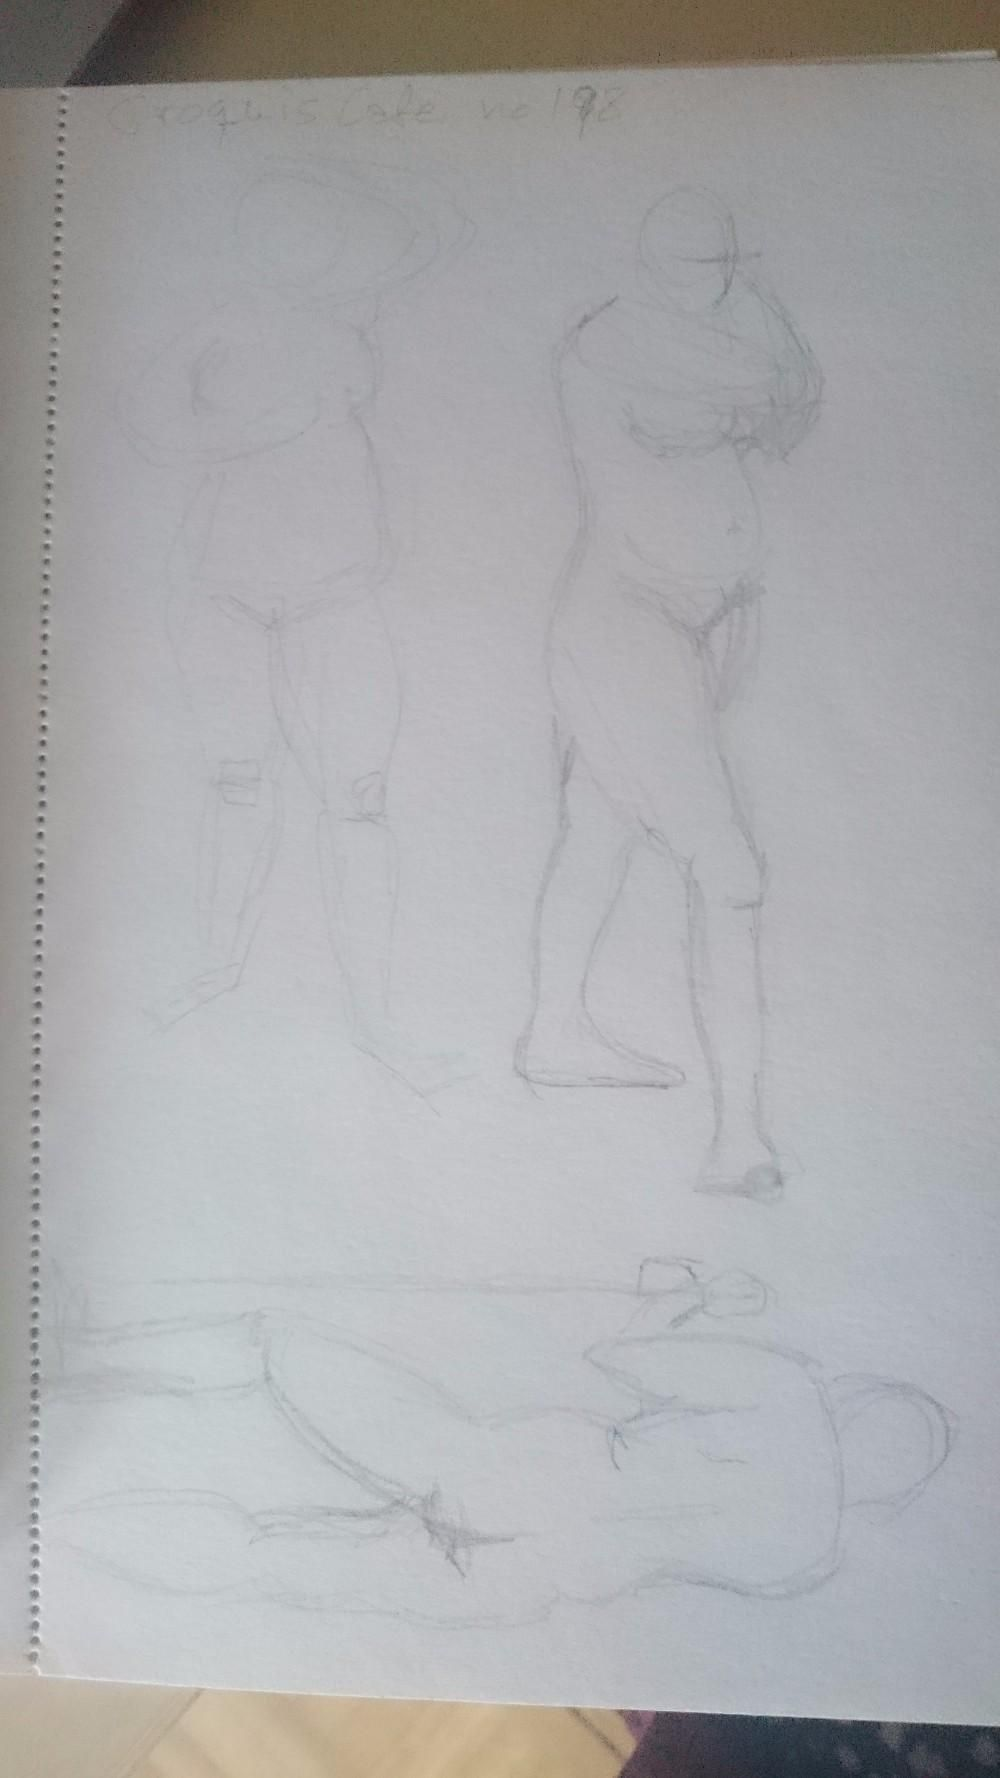 Sketchbook Magic - image 9 - student project